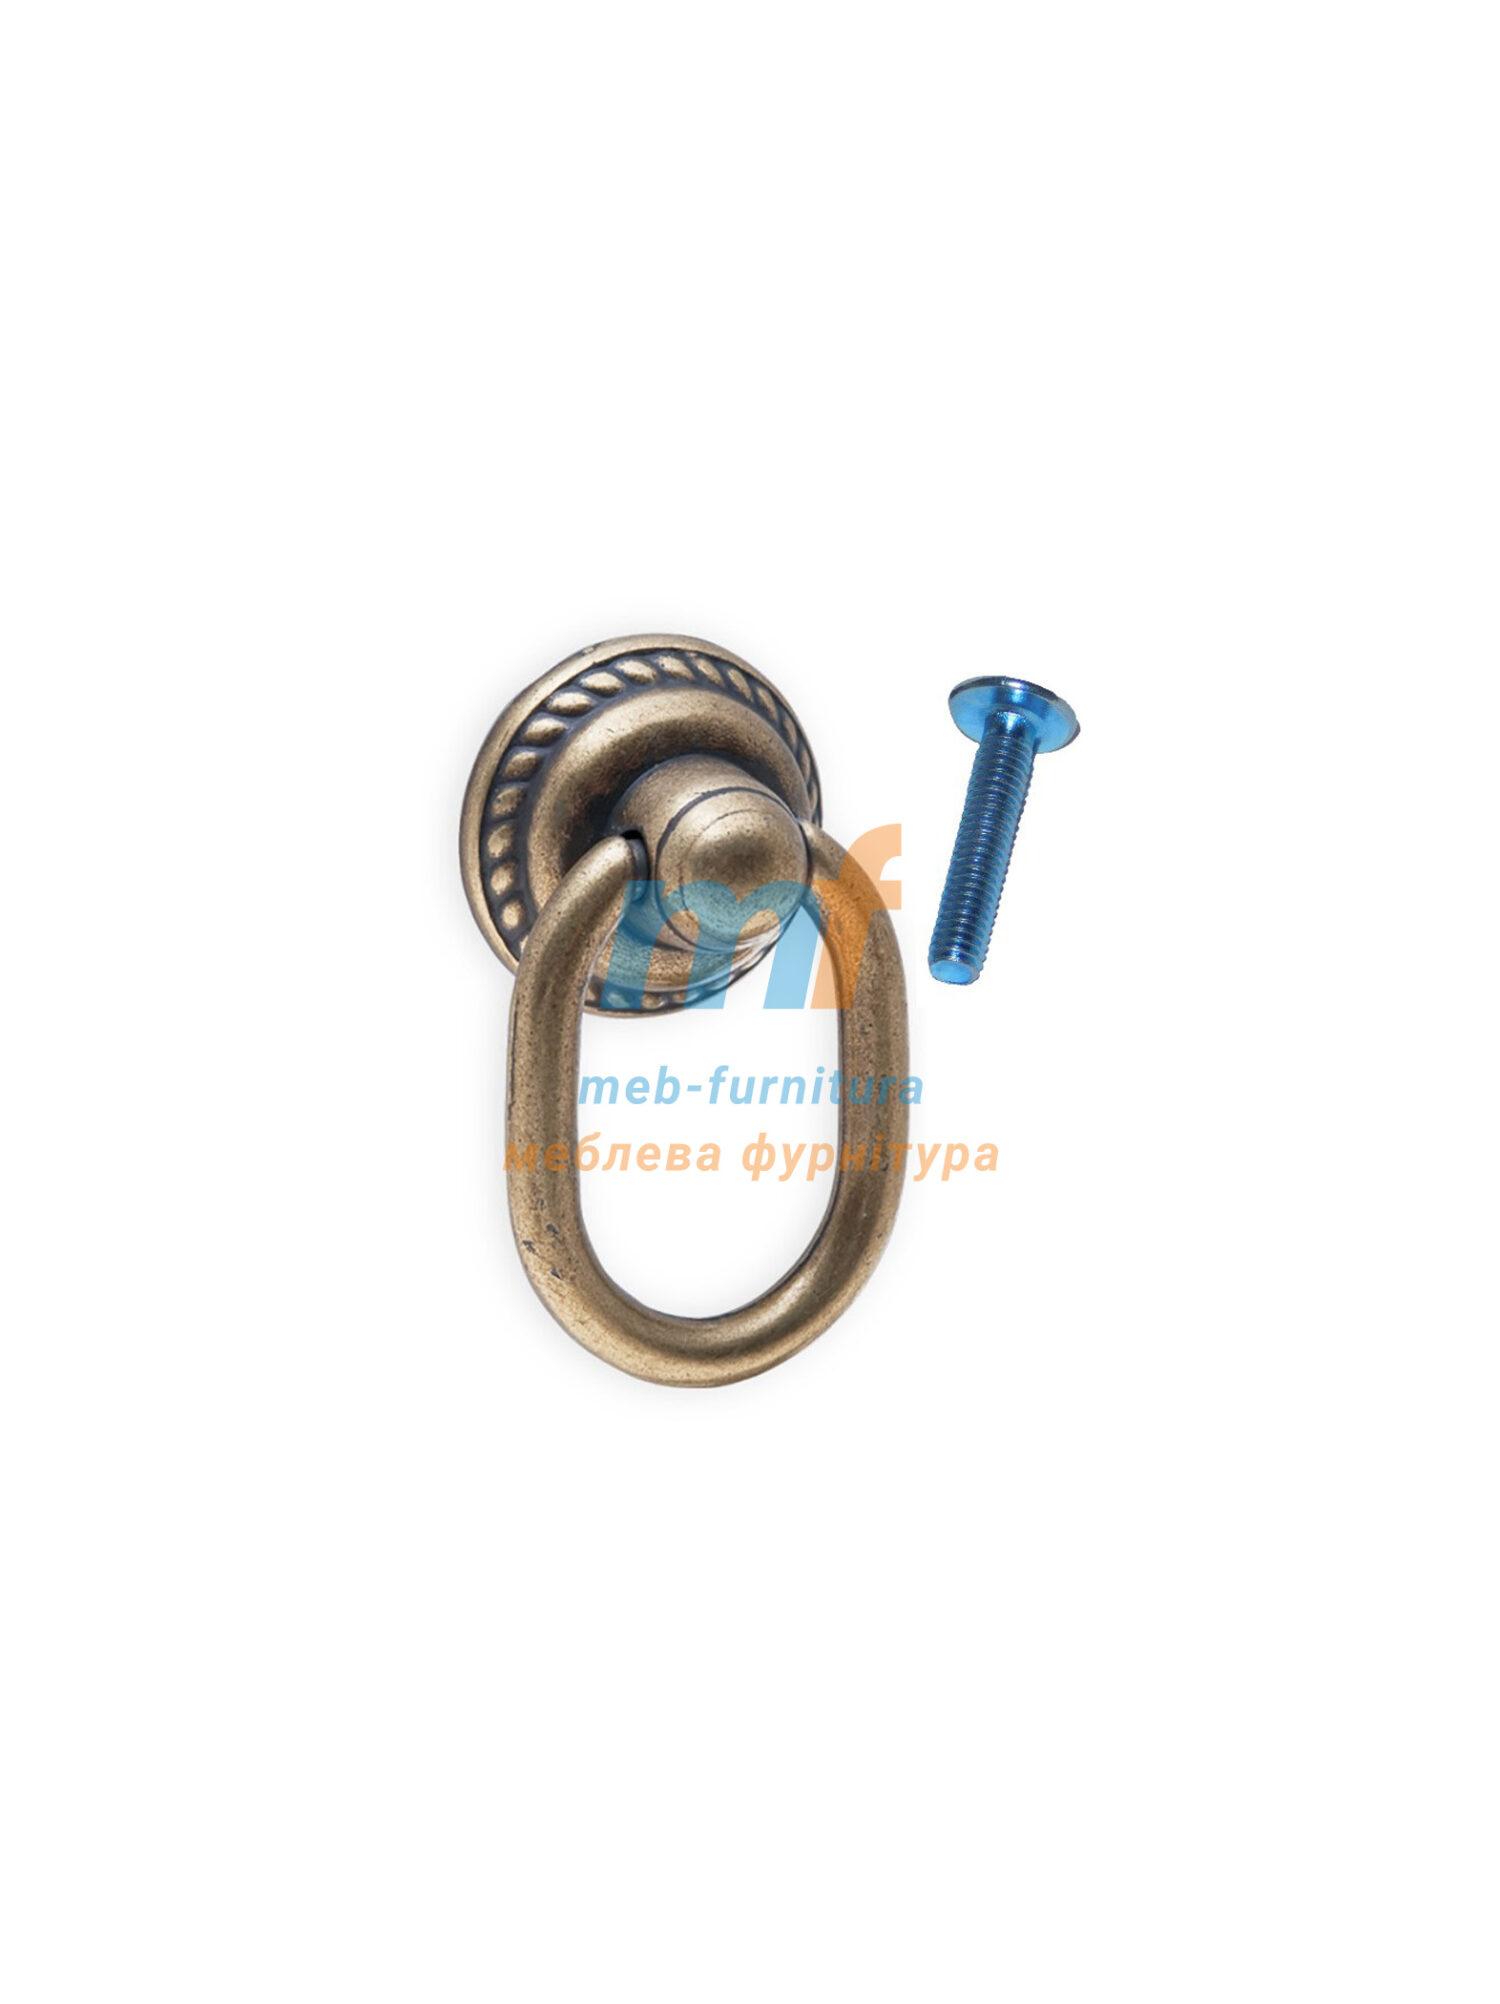 Ручка кольцо 1400 Кольцо Турция - коричнева